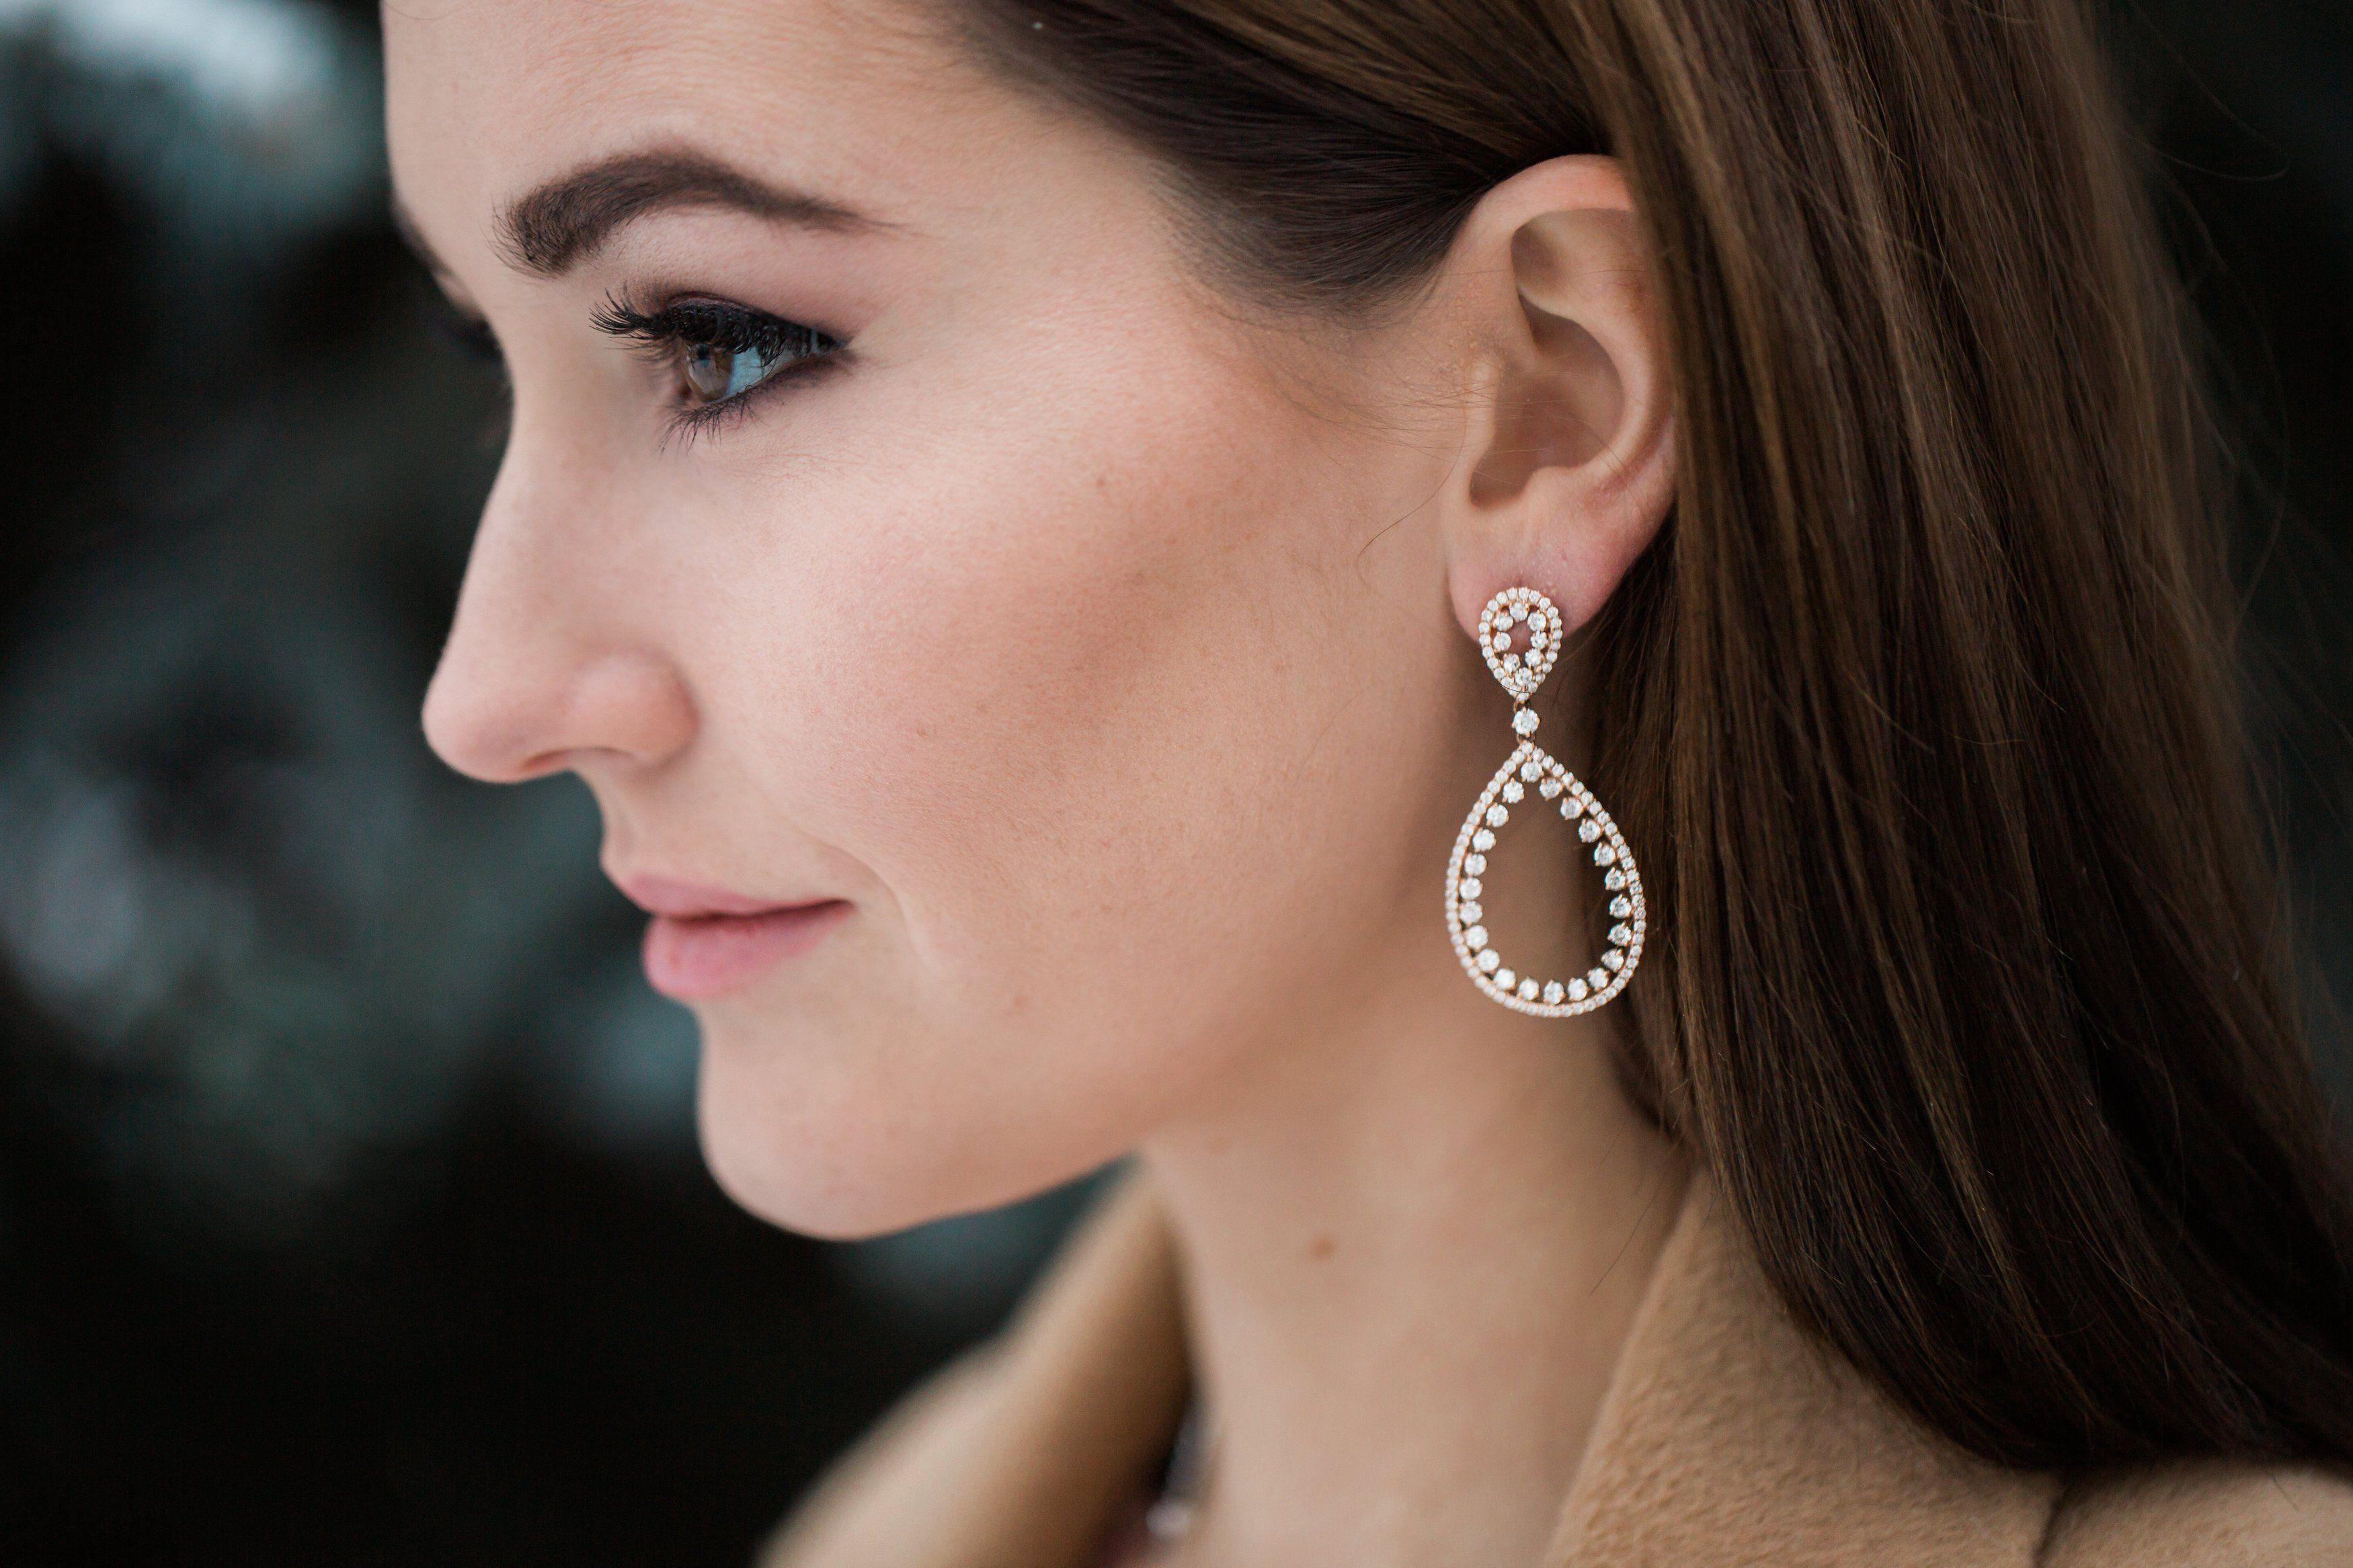 18++ Local jewelers who buy jewelry information